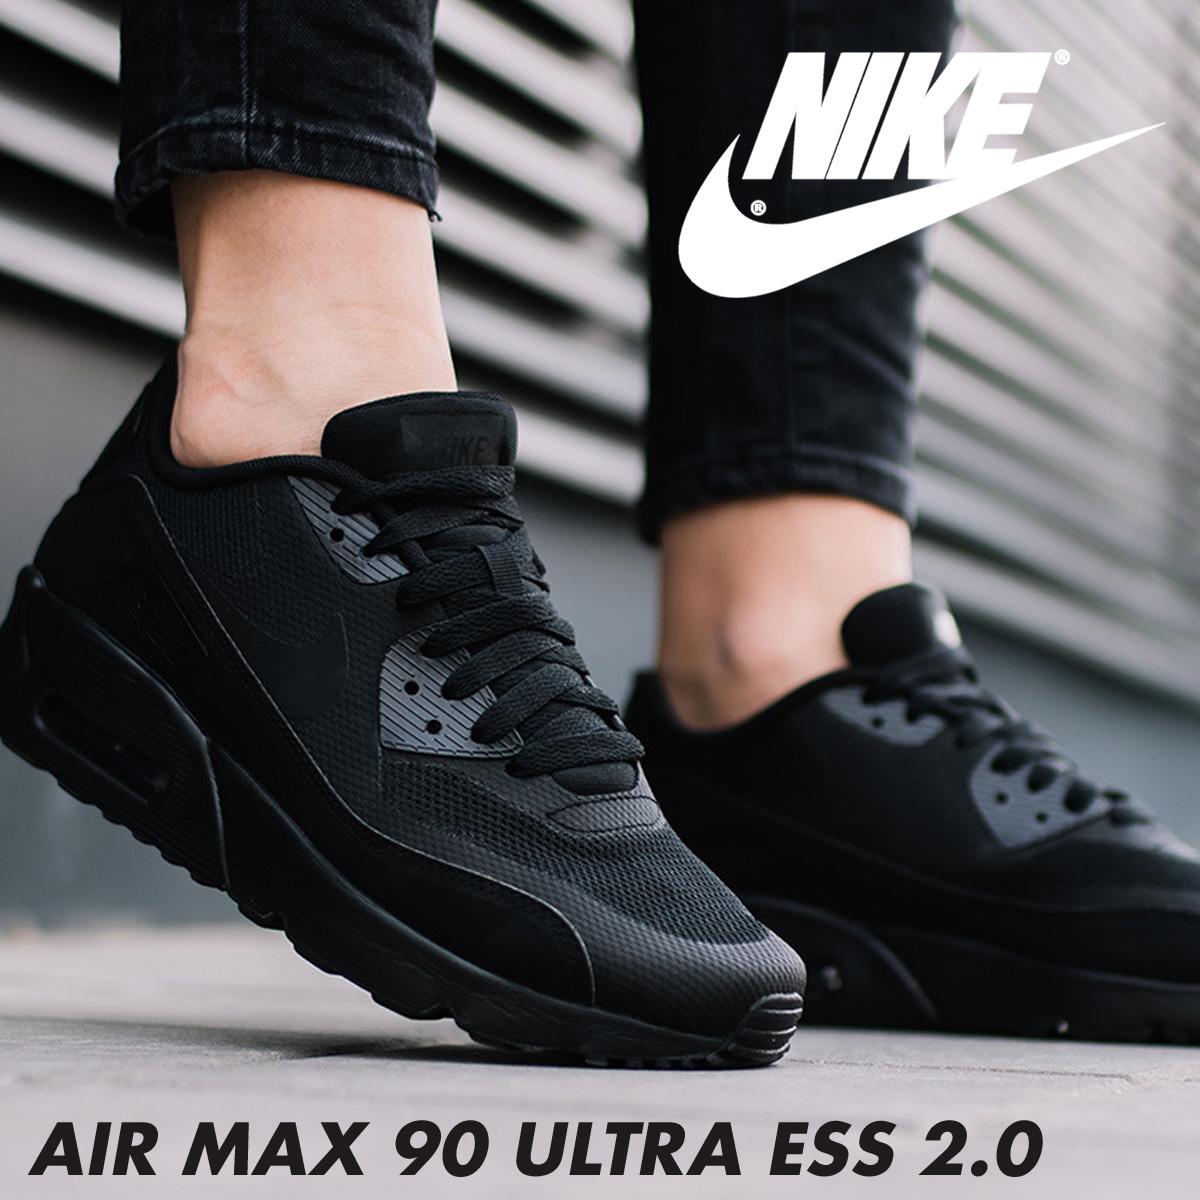 buy online f36b0 9f7f4 NIKE AIR MAX 90 ULTRA ESS 2.0 GS Kie Ney AMAX 90 Lady s sneakers  869,950-001 black  189